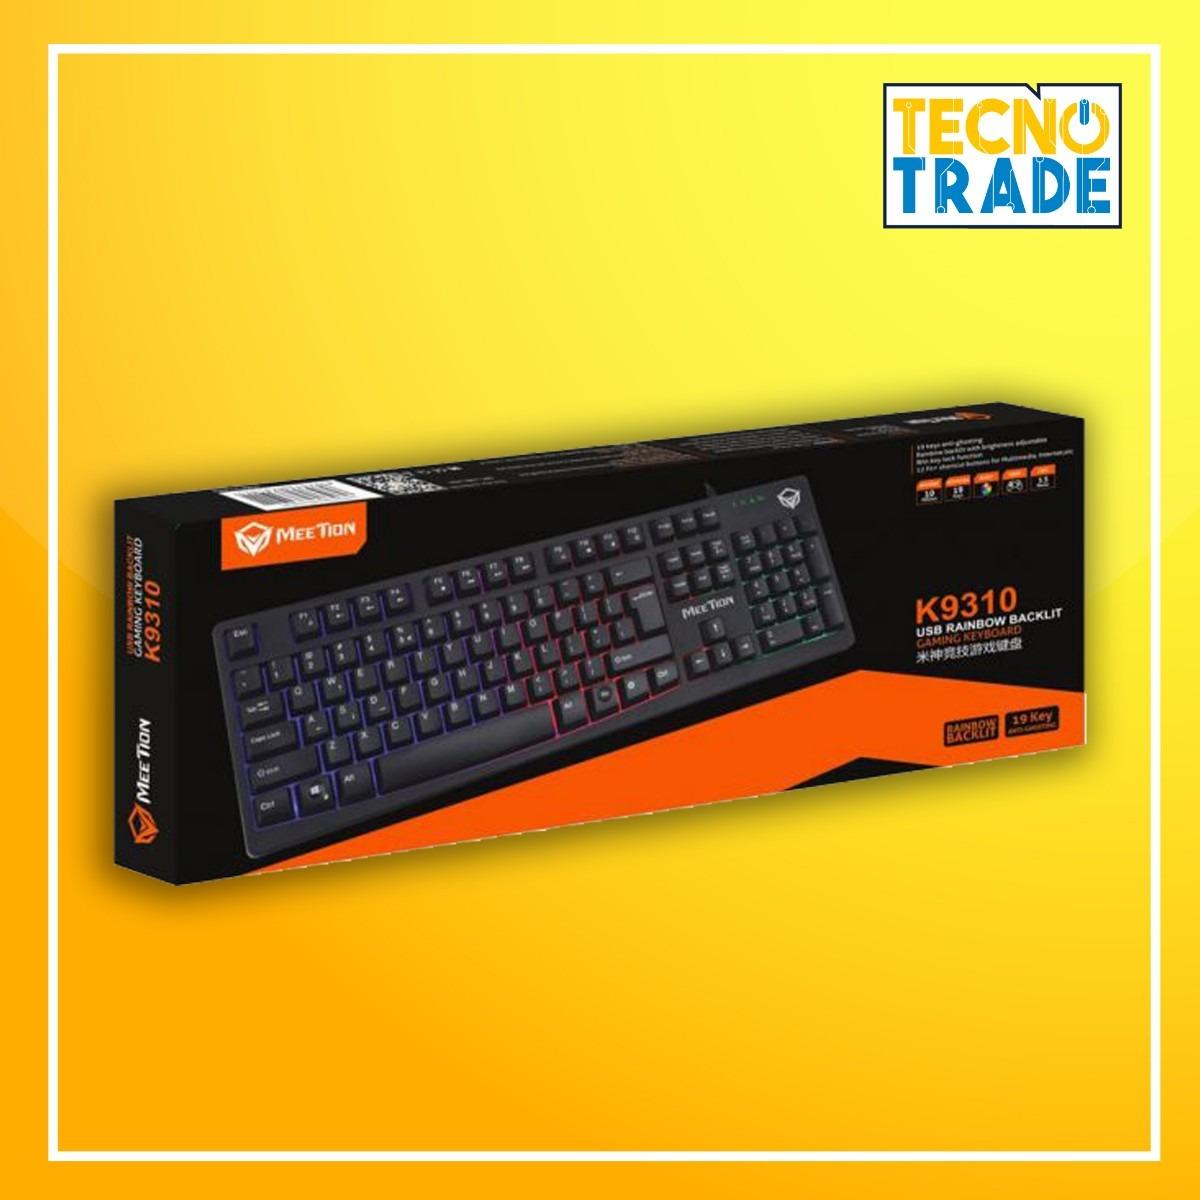 6bbbb7d7a0a teclado gamer meetion k9300 gamer backlit retroiluminado. Cargando zoom.